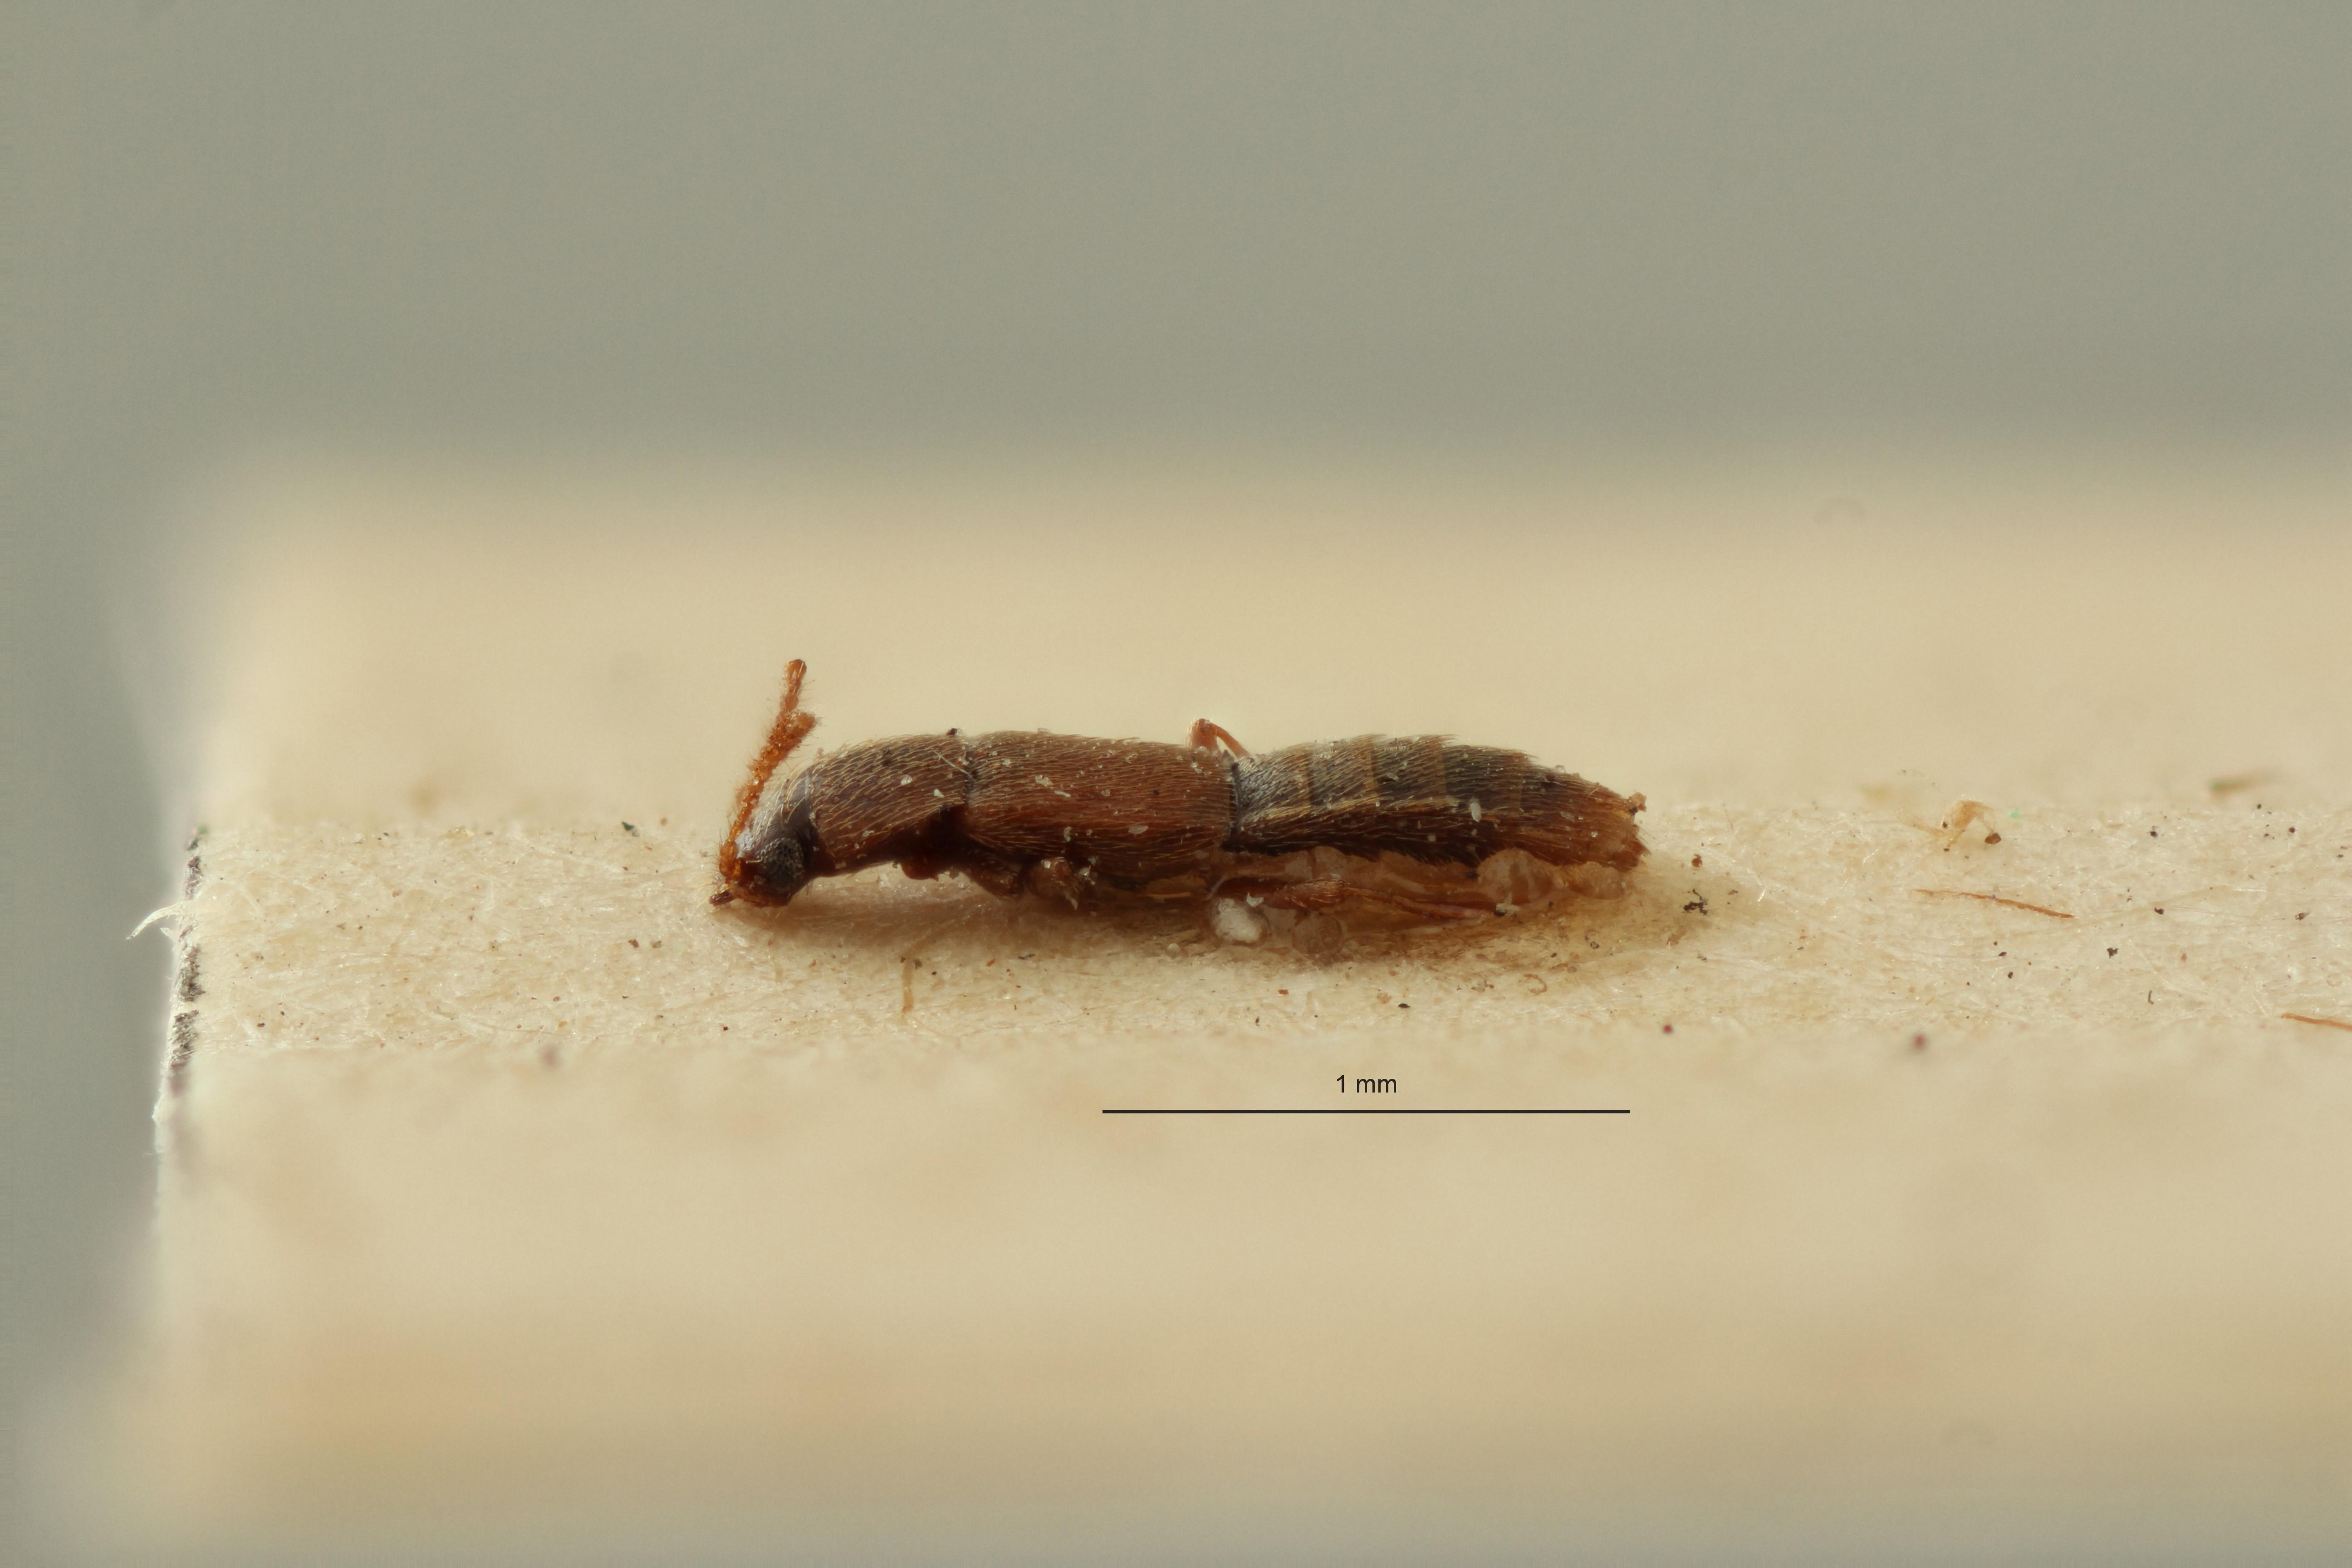 Phloeoecharis normandi t L ZS PMax Scaled.jpeg